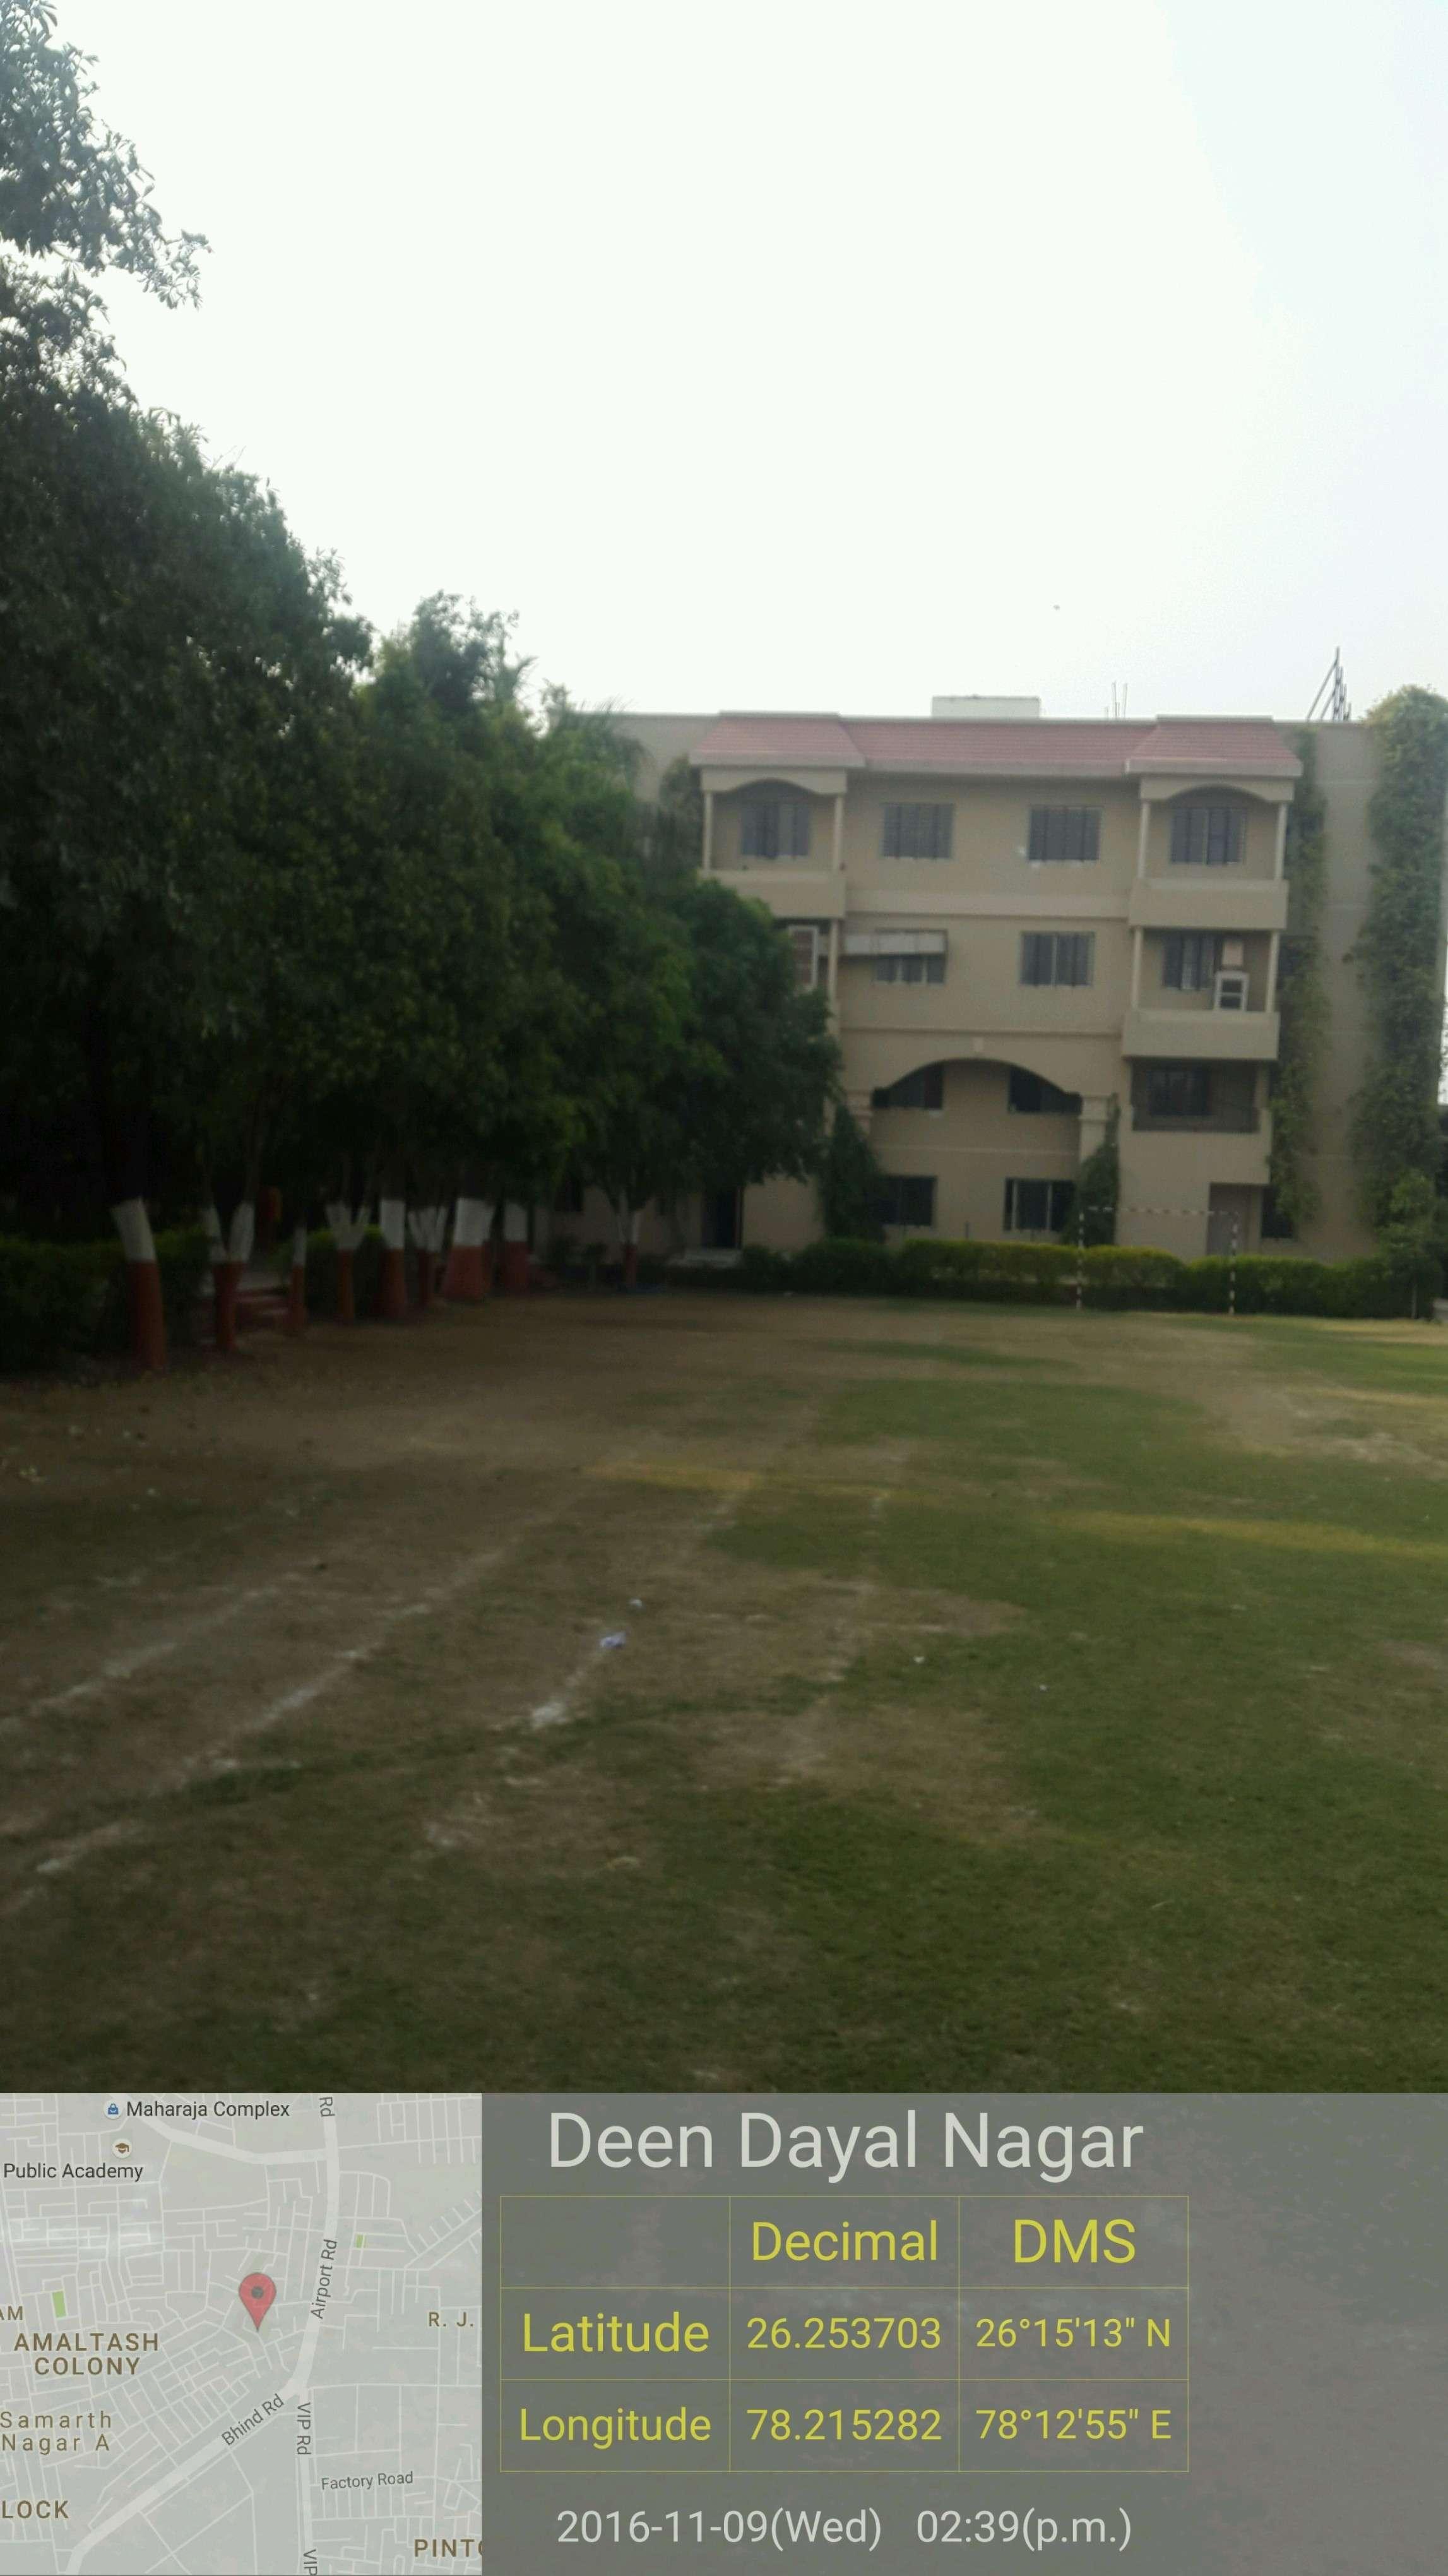 VIDYA BHAVAN PUBLIC SCHOOL KAVI NAGAR NEAR PINTO PARK TIRAHA AIR PORT ROAD MORAR GUWALIOR MP 1030275